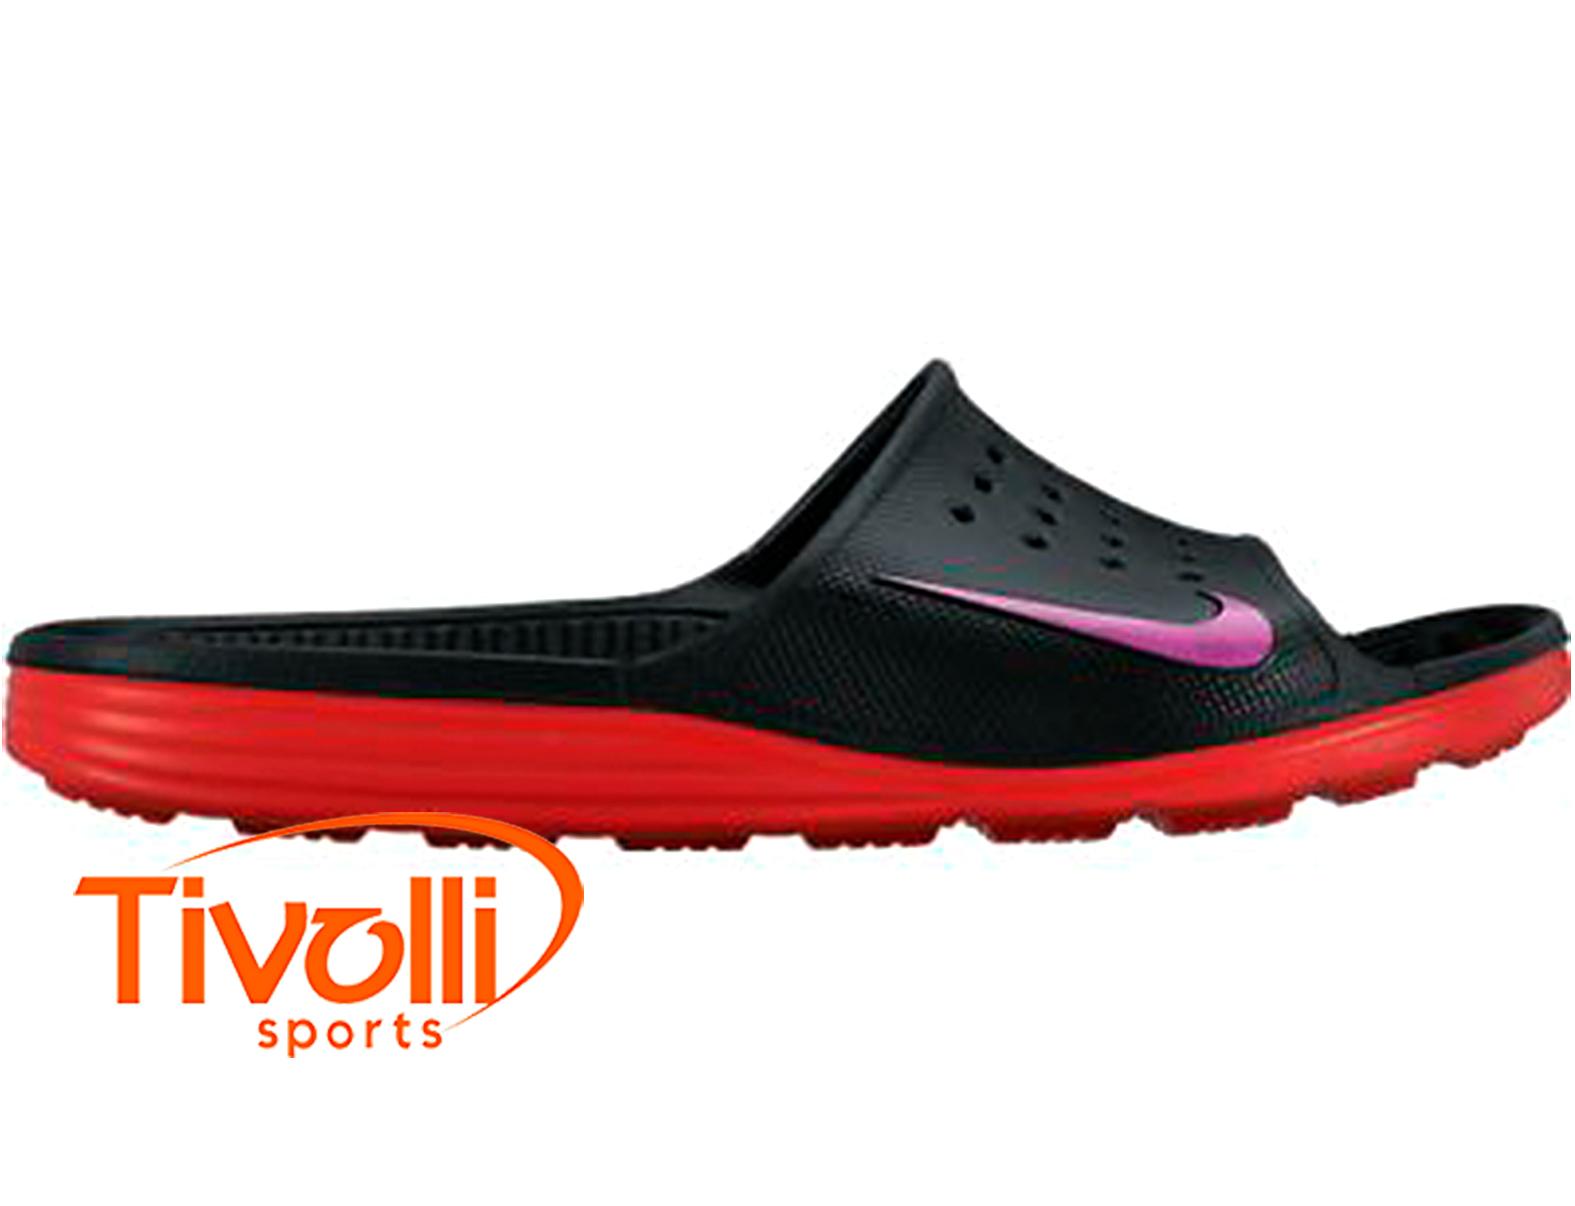 cd31b251ff Chinelo Nike Solarsoft Slide > masculino preto, vermelho e roxo >